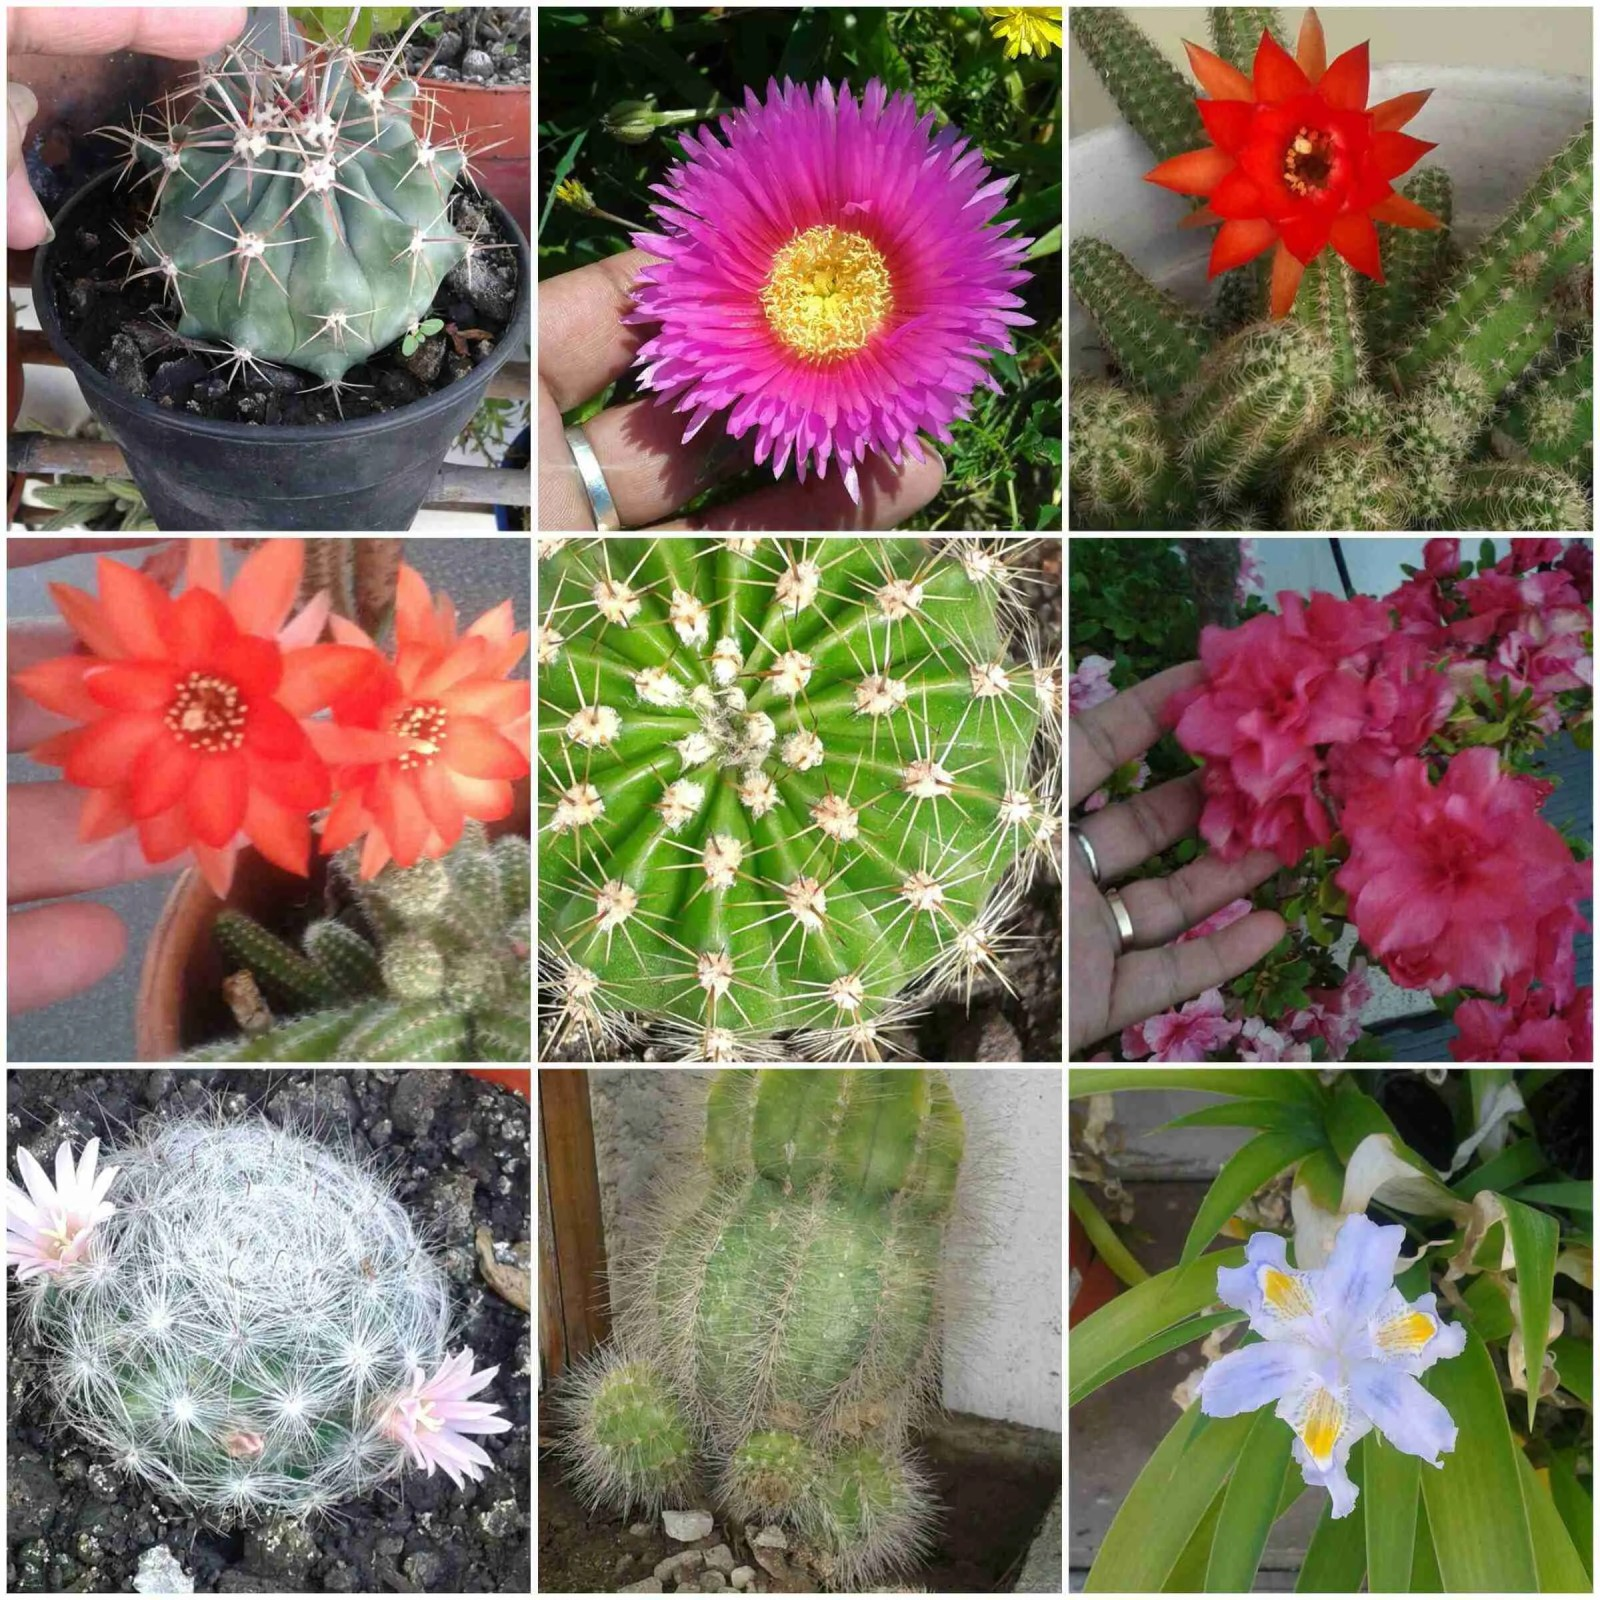 Las plantas de Yoli - Mis Plantas Tus Plantas 4